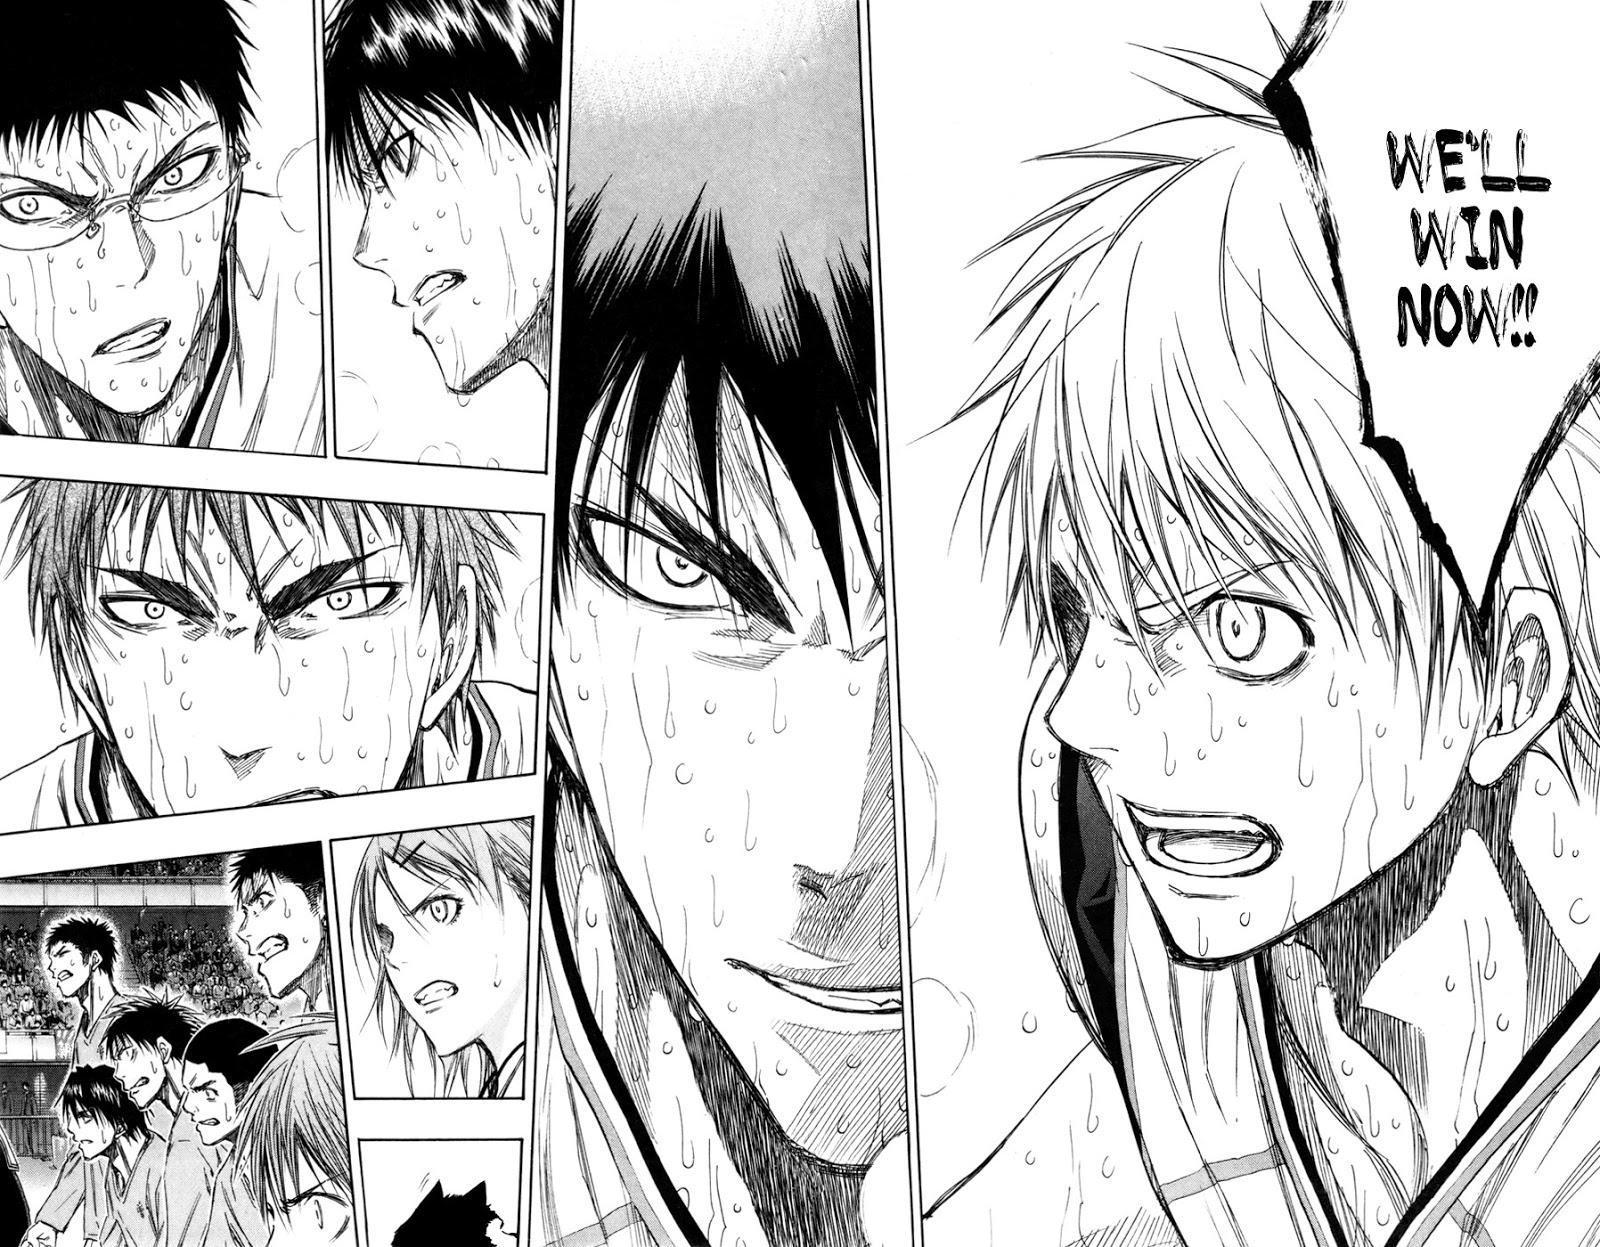 Kuroko no Basket Manga Chapter 128 - Image 12-13